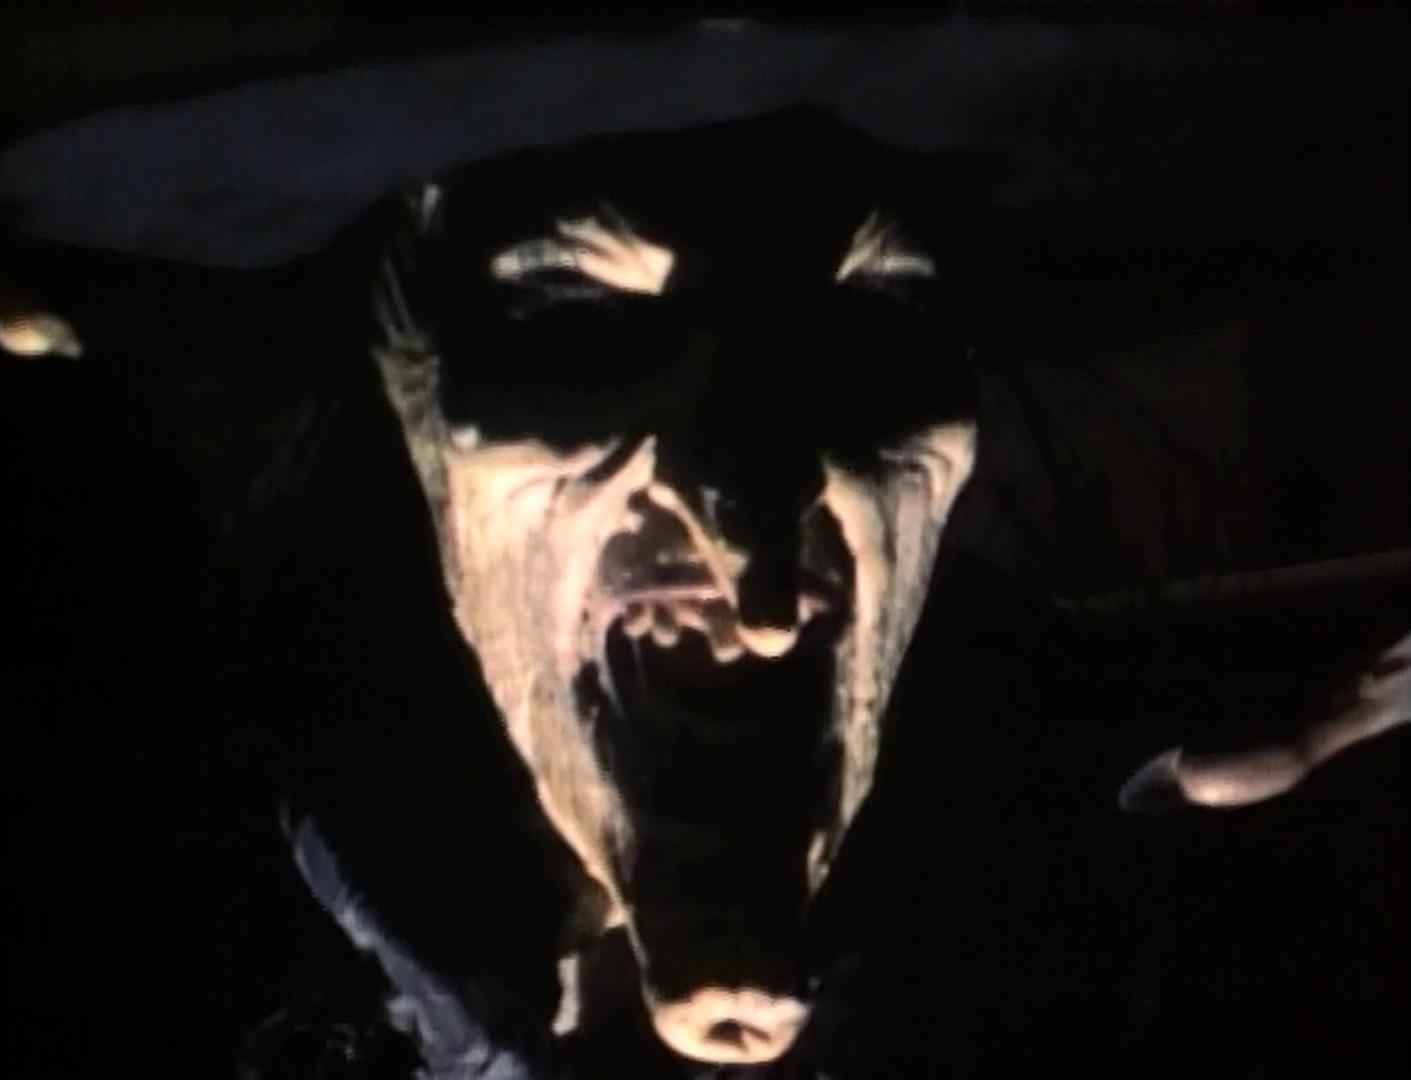 tales from the darkside season 1 episode 3